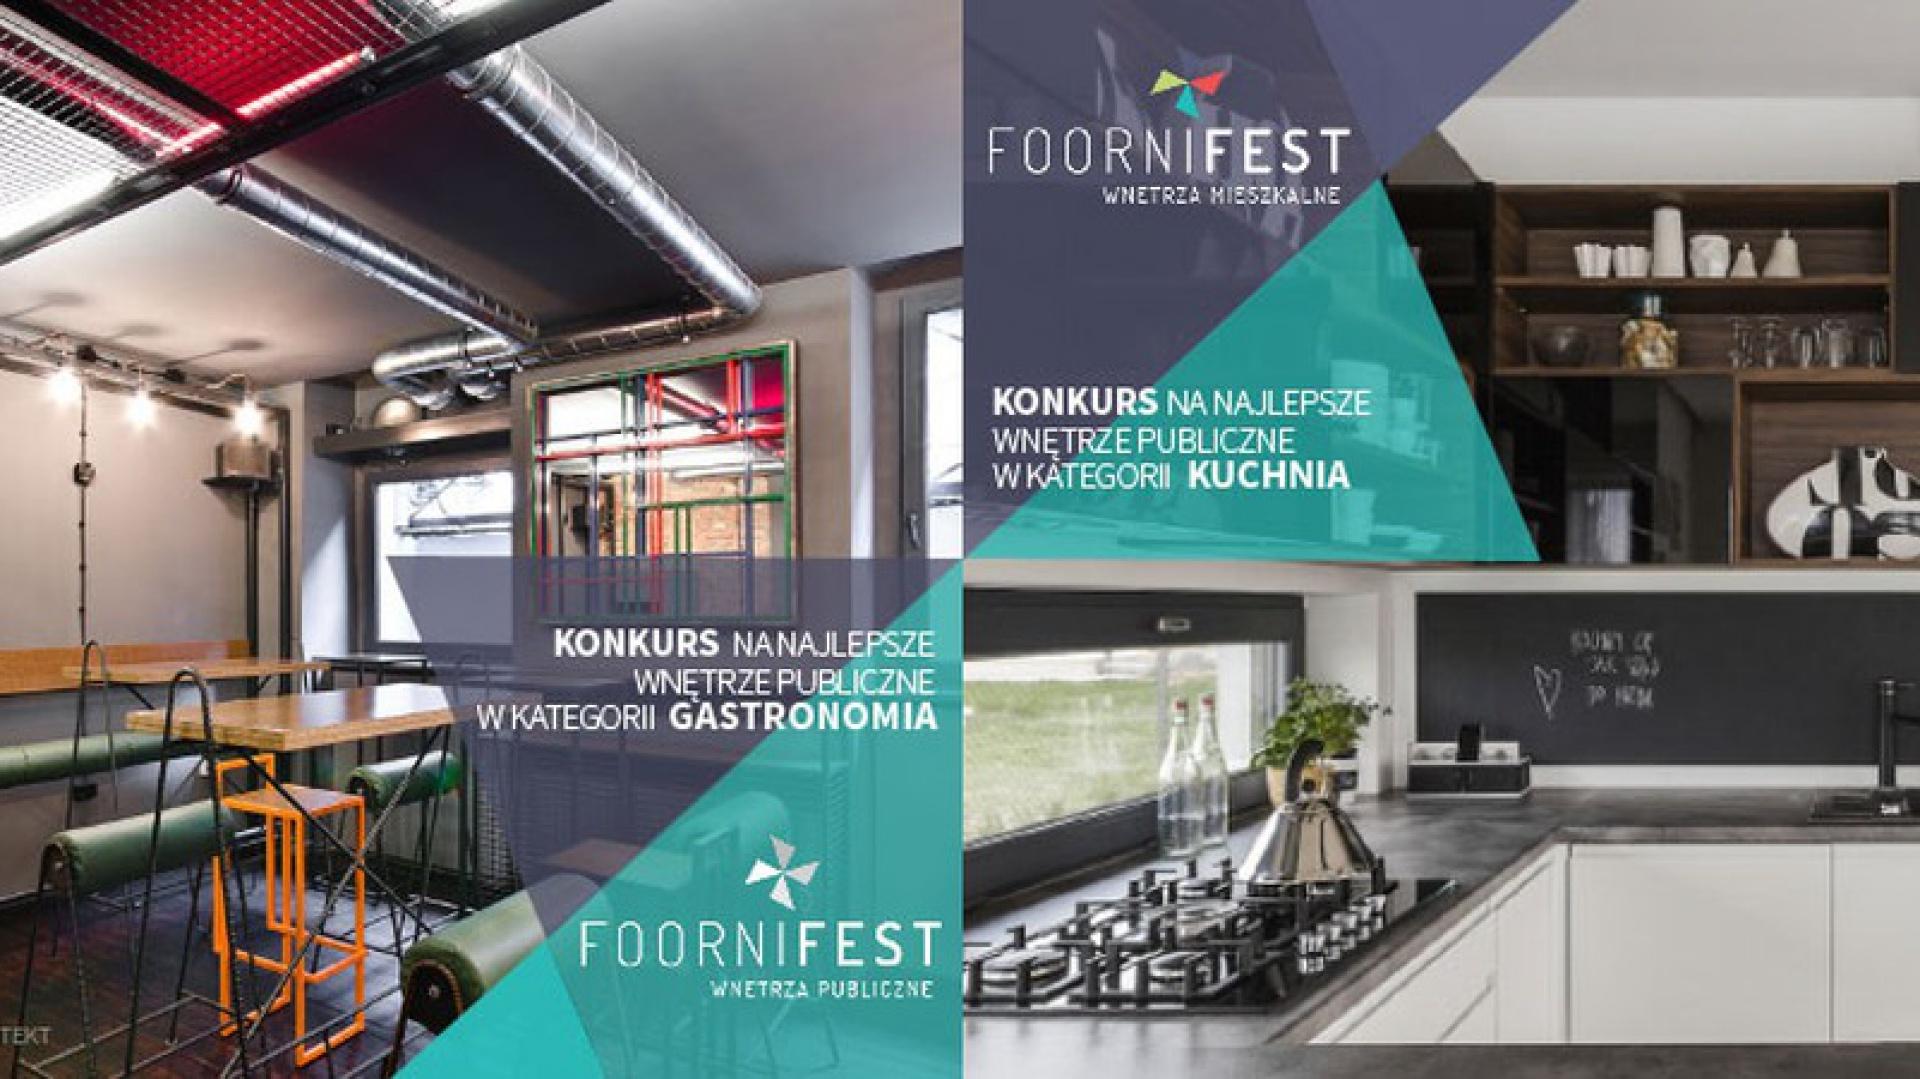 FoorniFEST-2016. Fot. Plakat prasowy